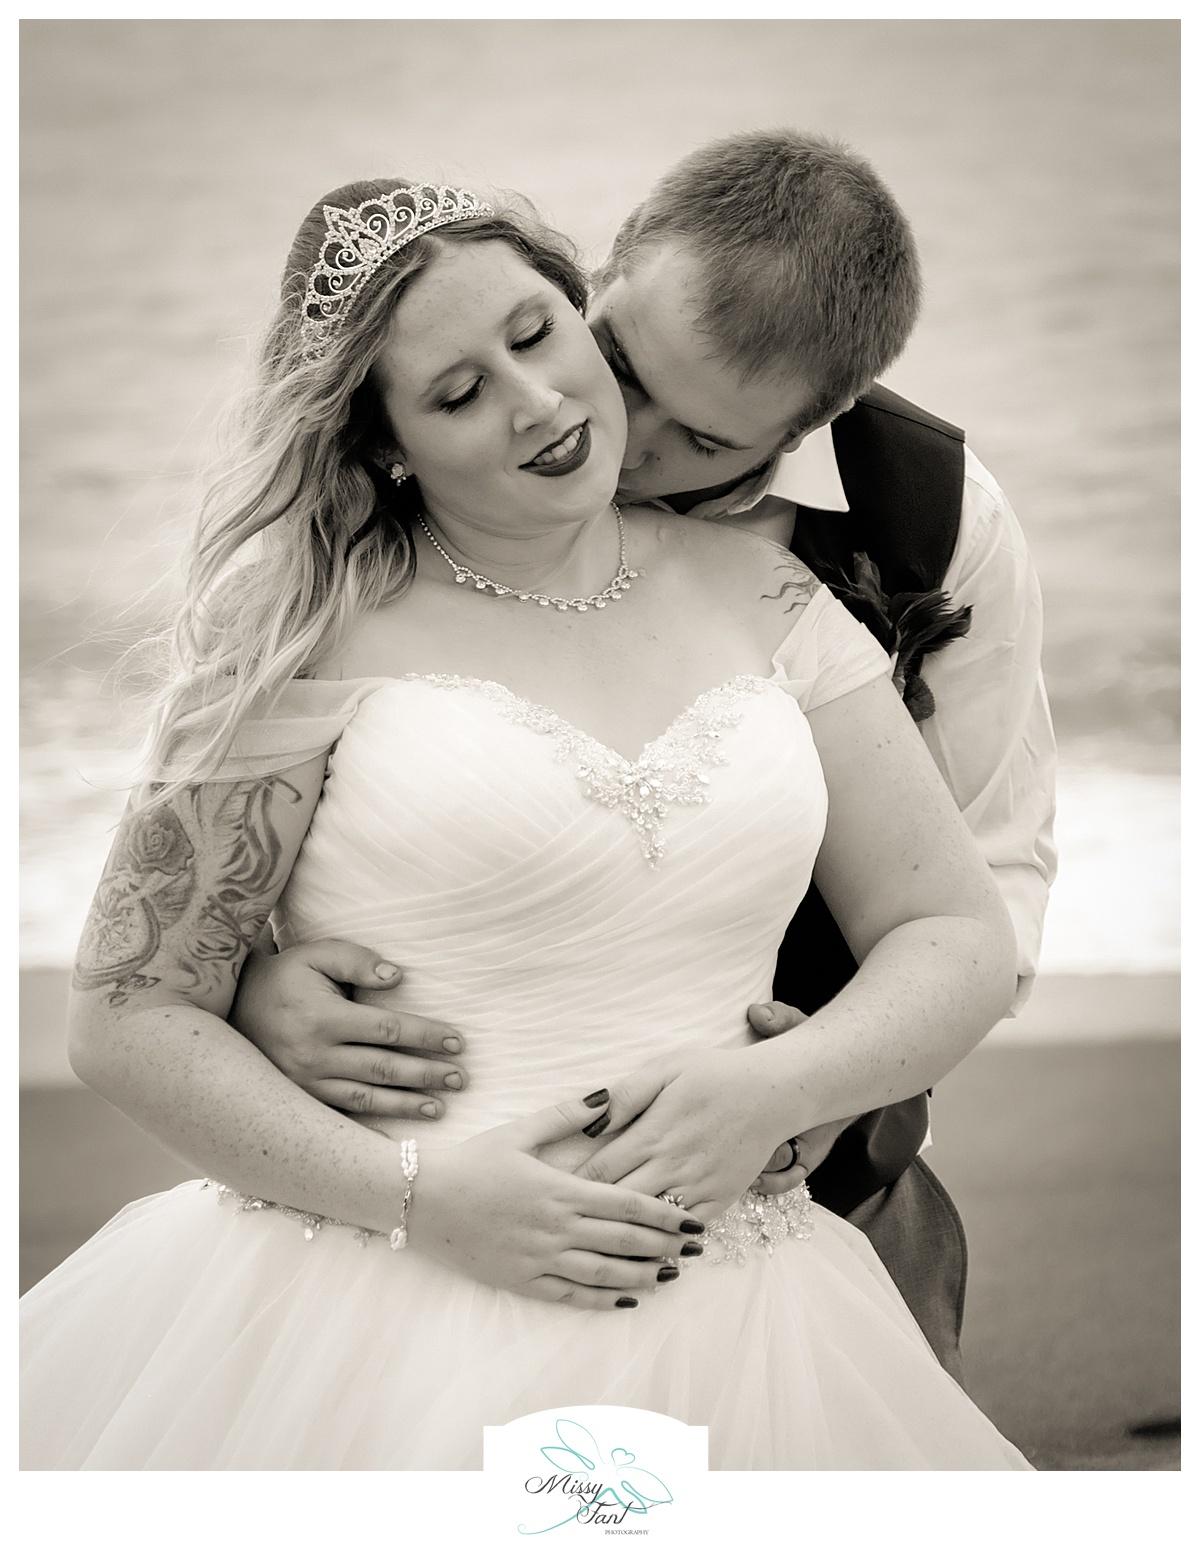 wedding photographer under $2000